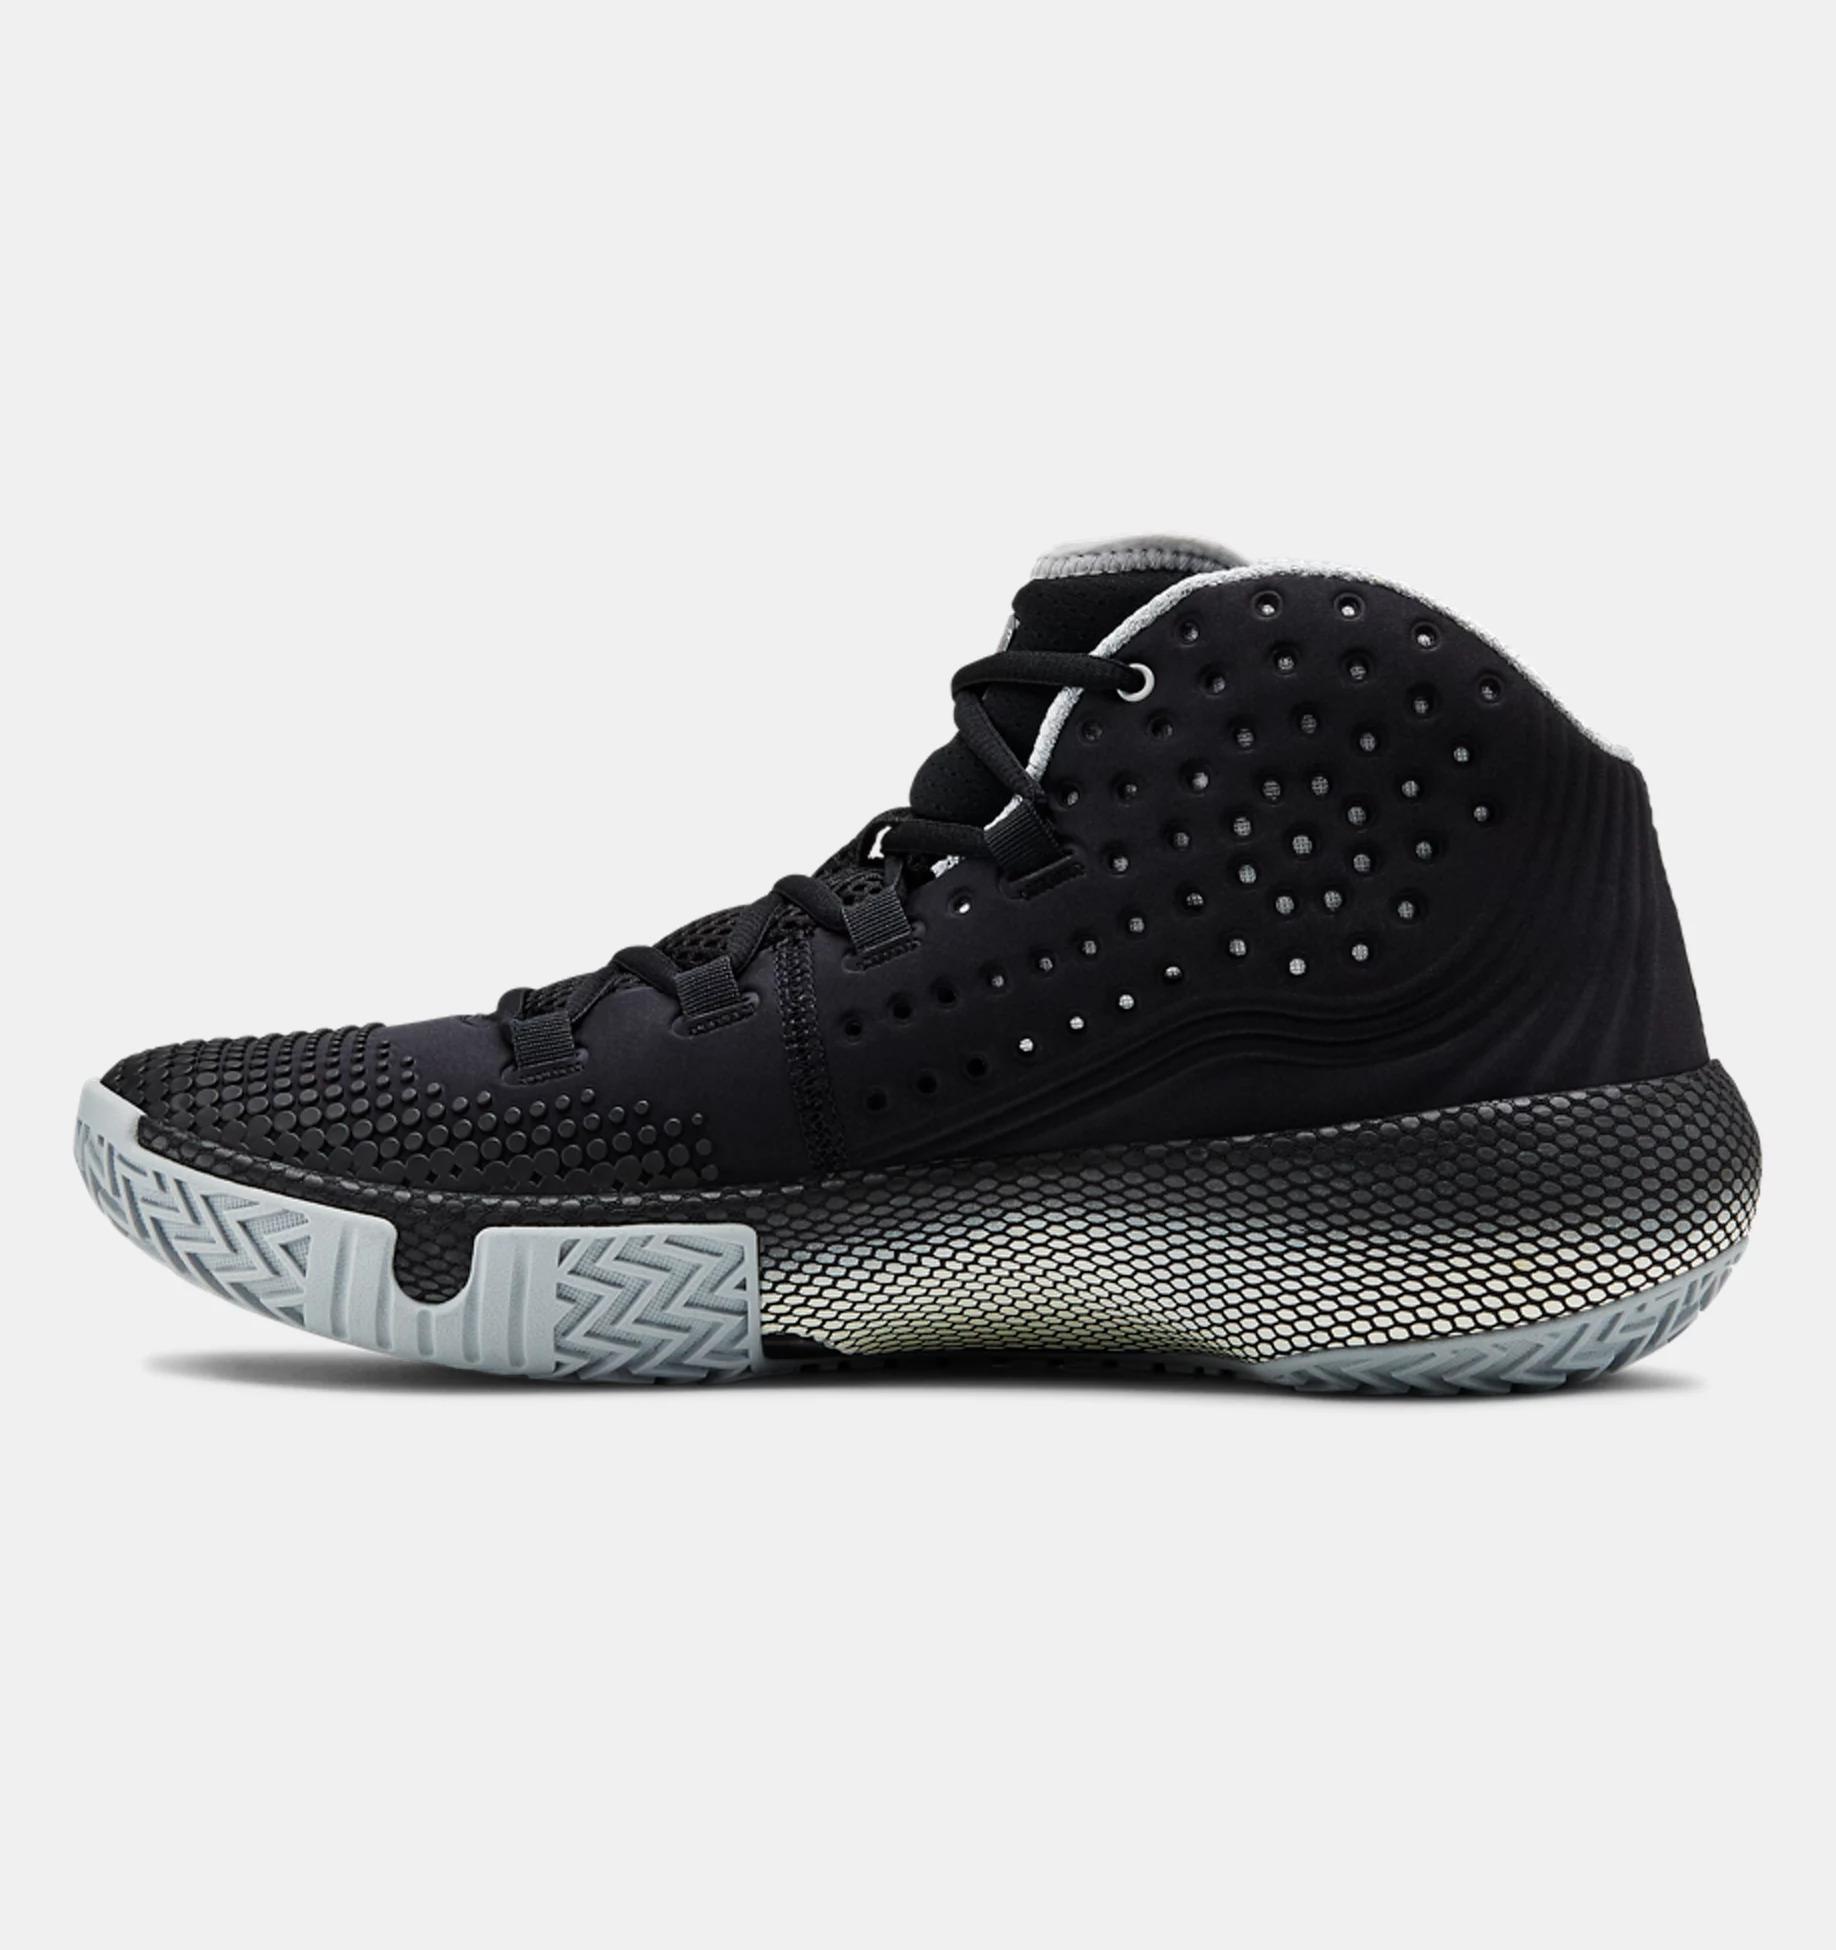 Lightest Basketball Shoes: HOVR Havoc 2